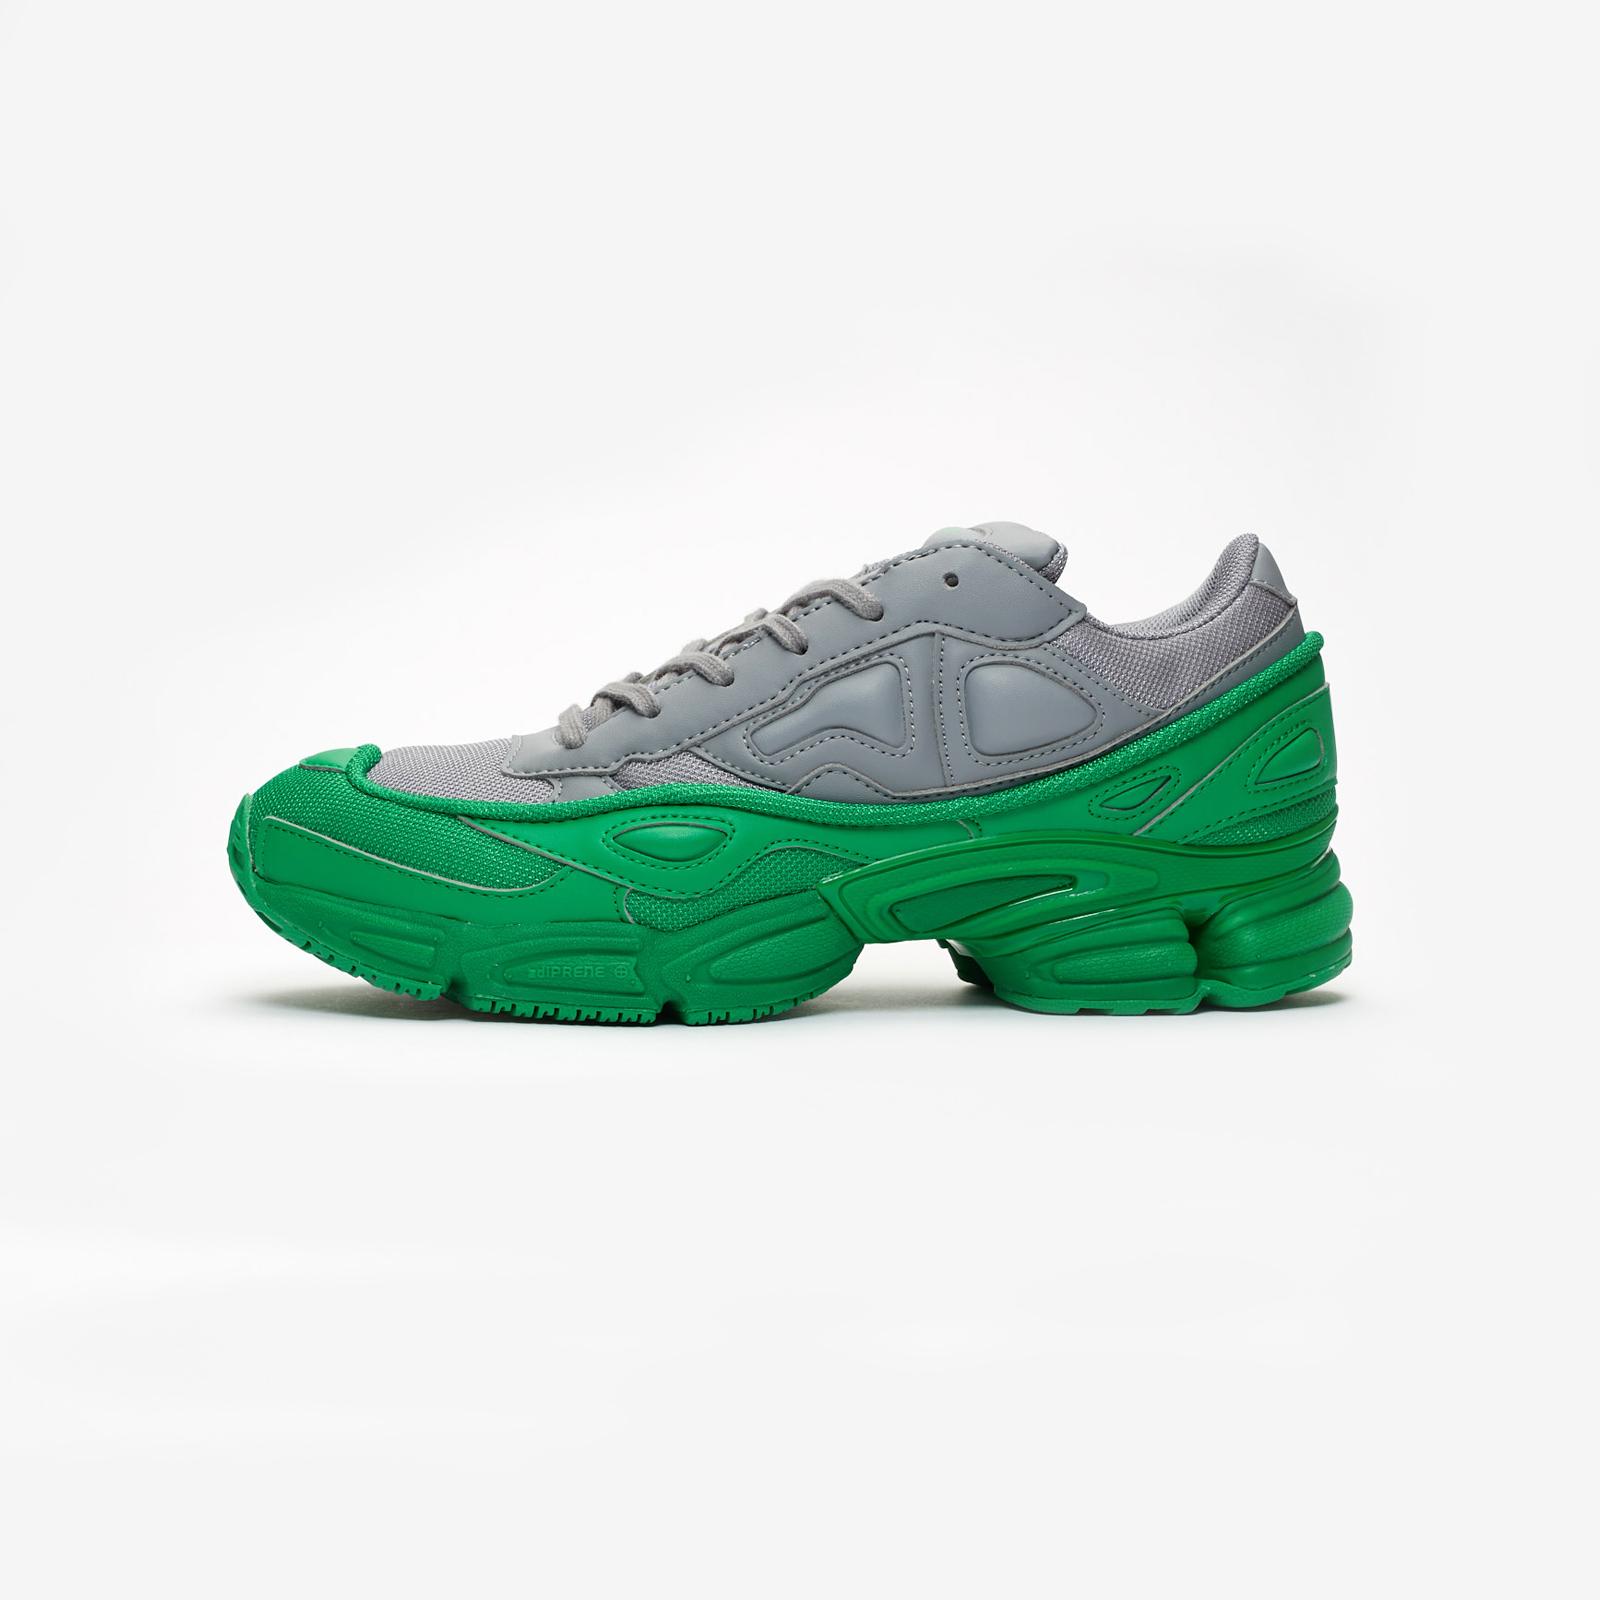 e457ac930bb adidas Raf Simons Ozweego - F34266 - Sneakersnstuff | sneakers ...